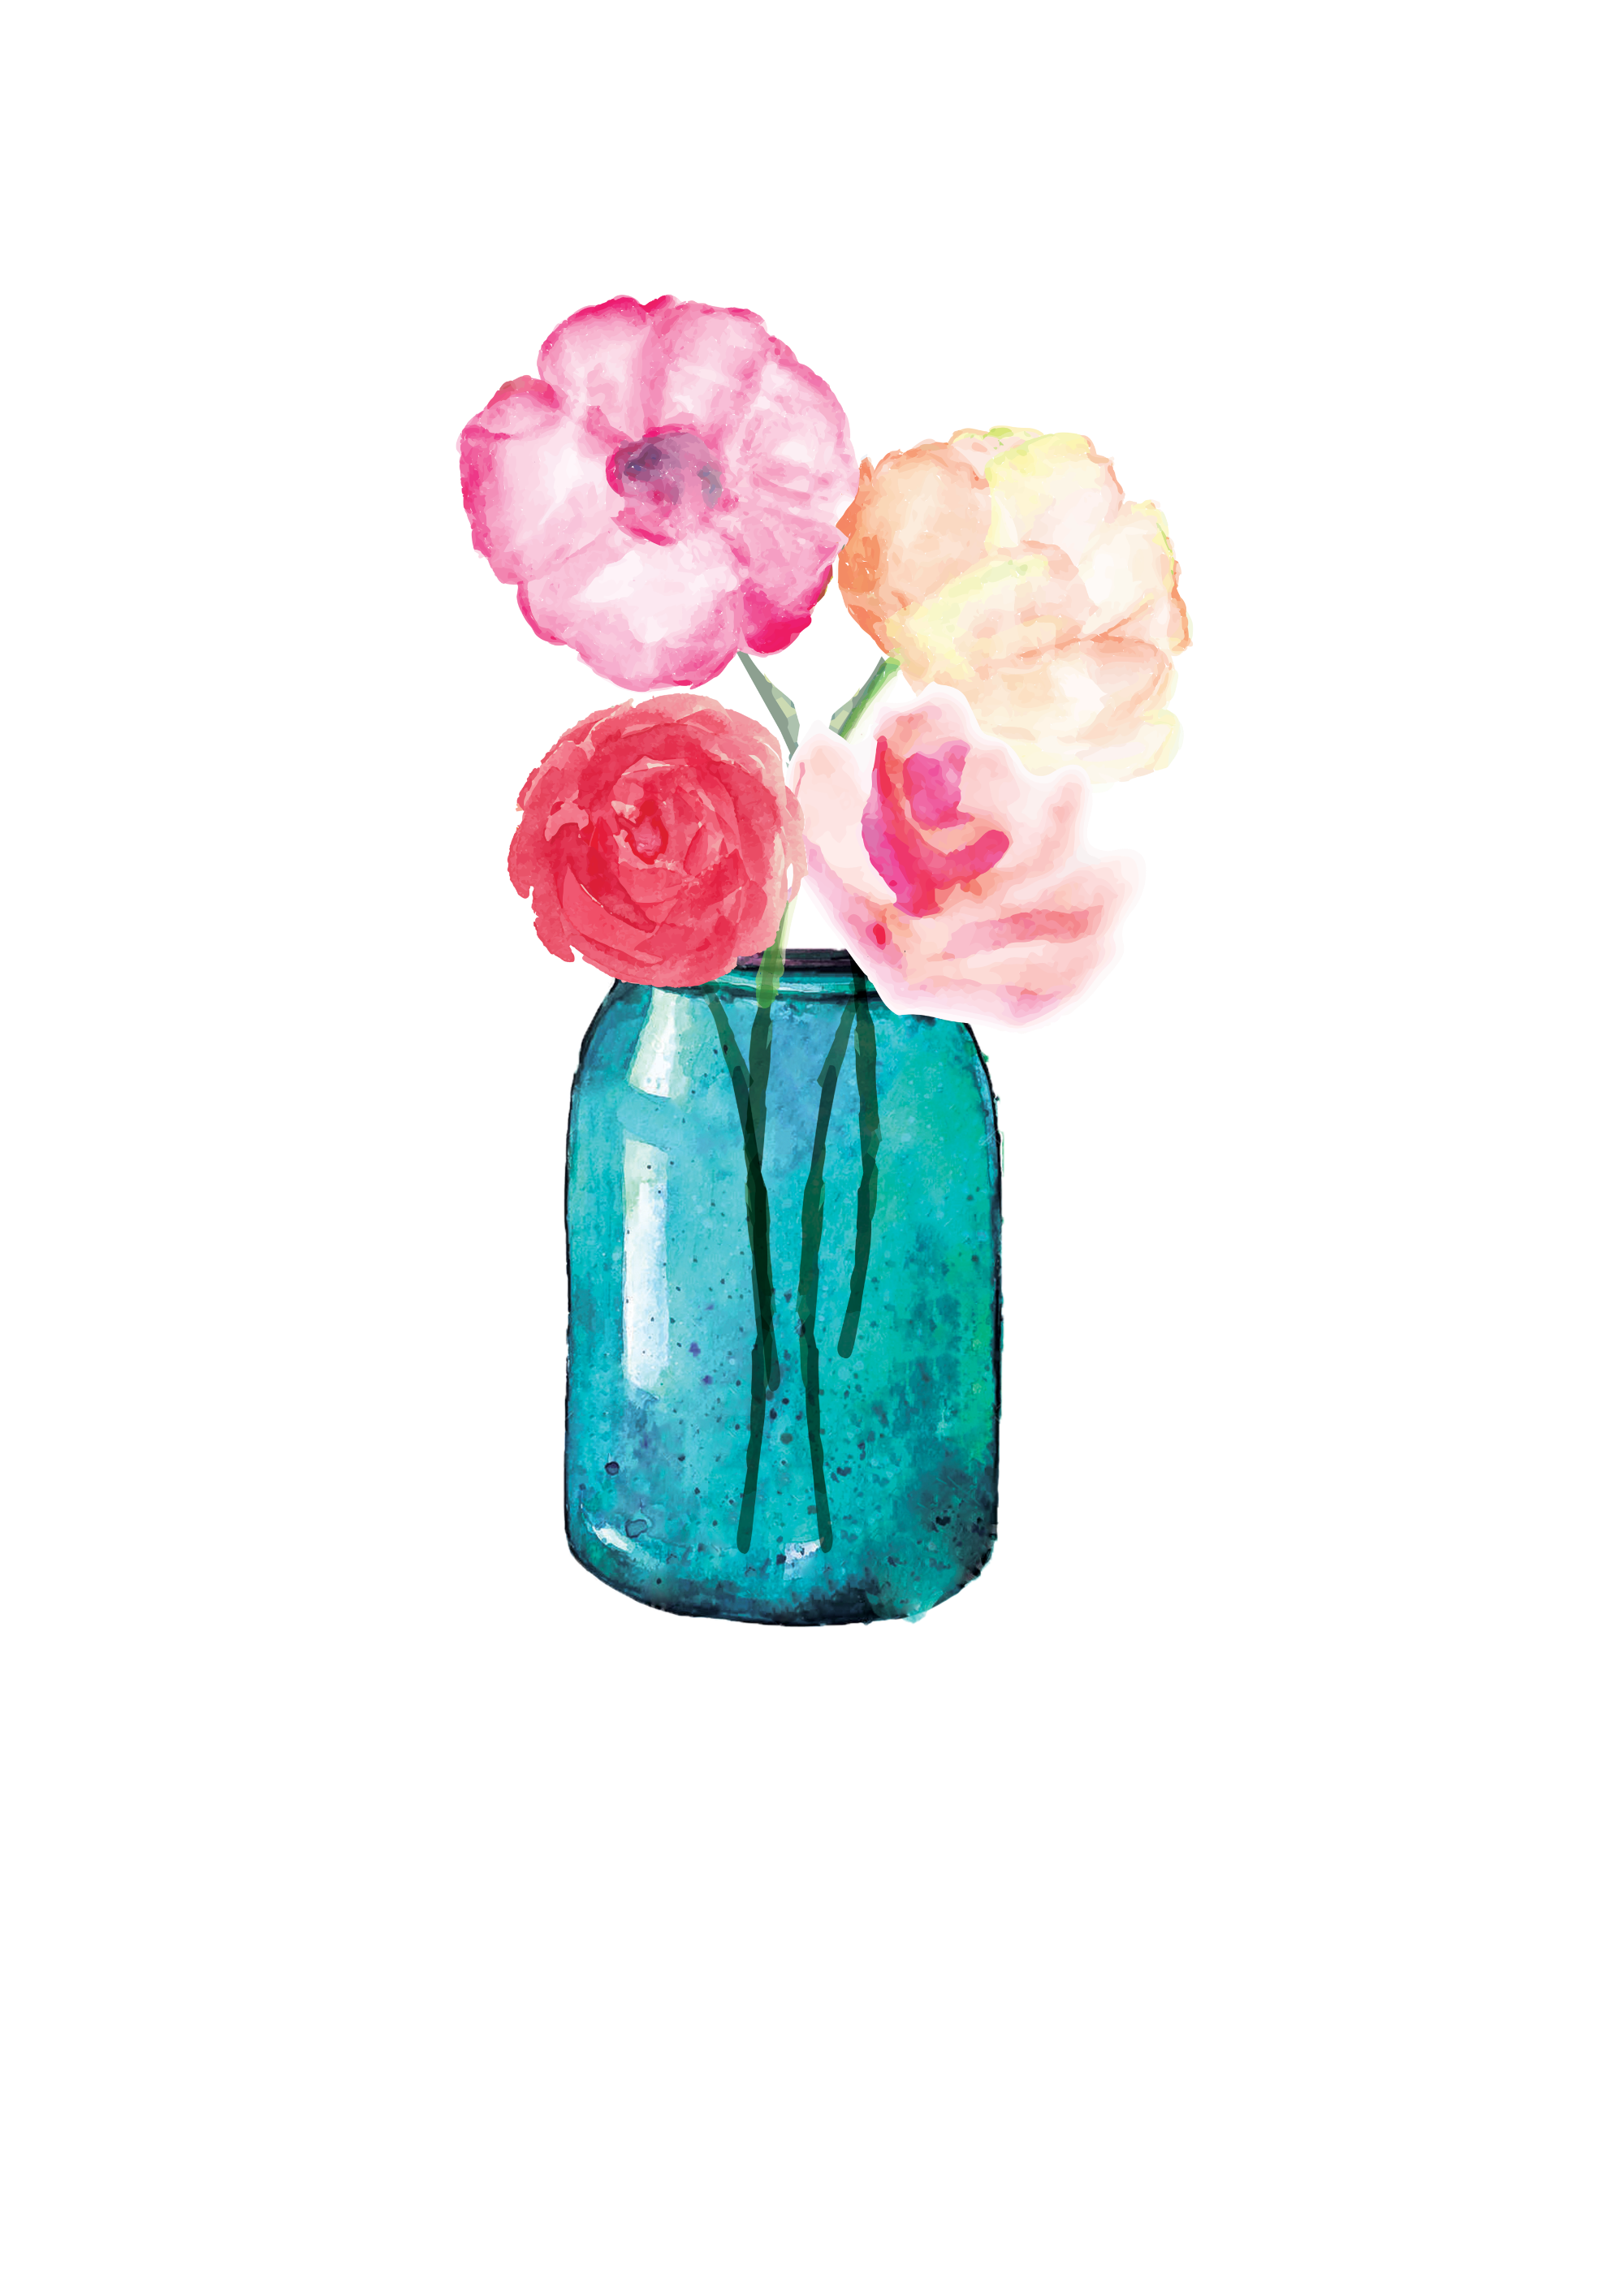 Mason jar flower clipart jpg download Lauren Baxter : Flowers in a Mason Jar | Watercolor | Pinterest ... jpg download